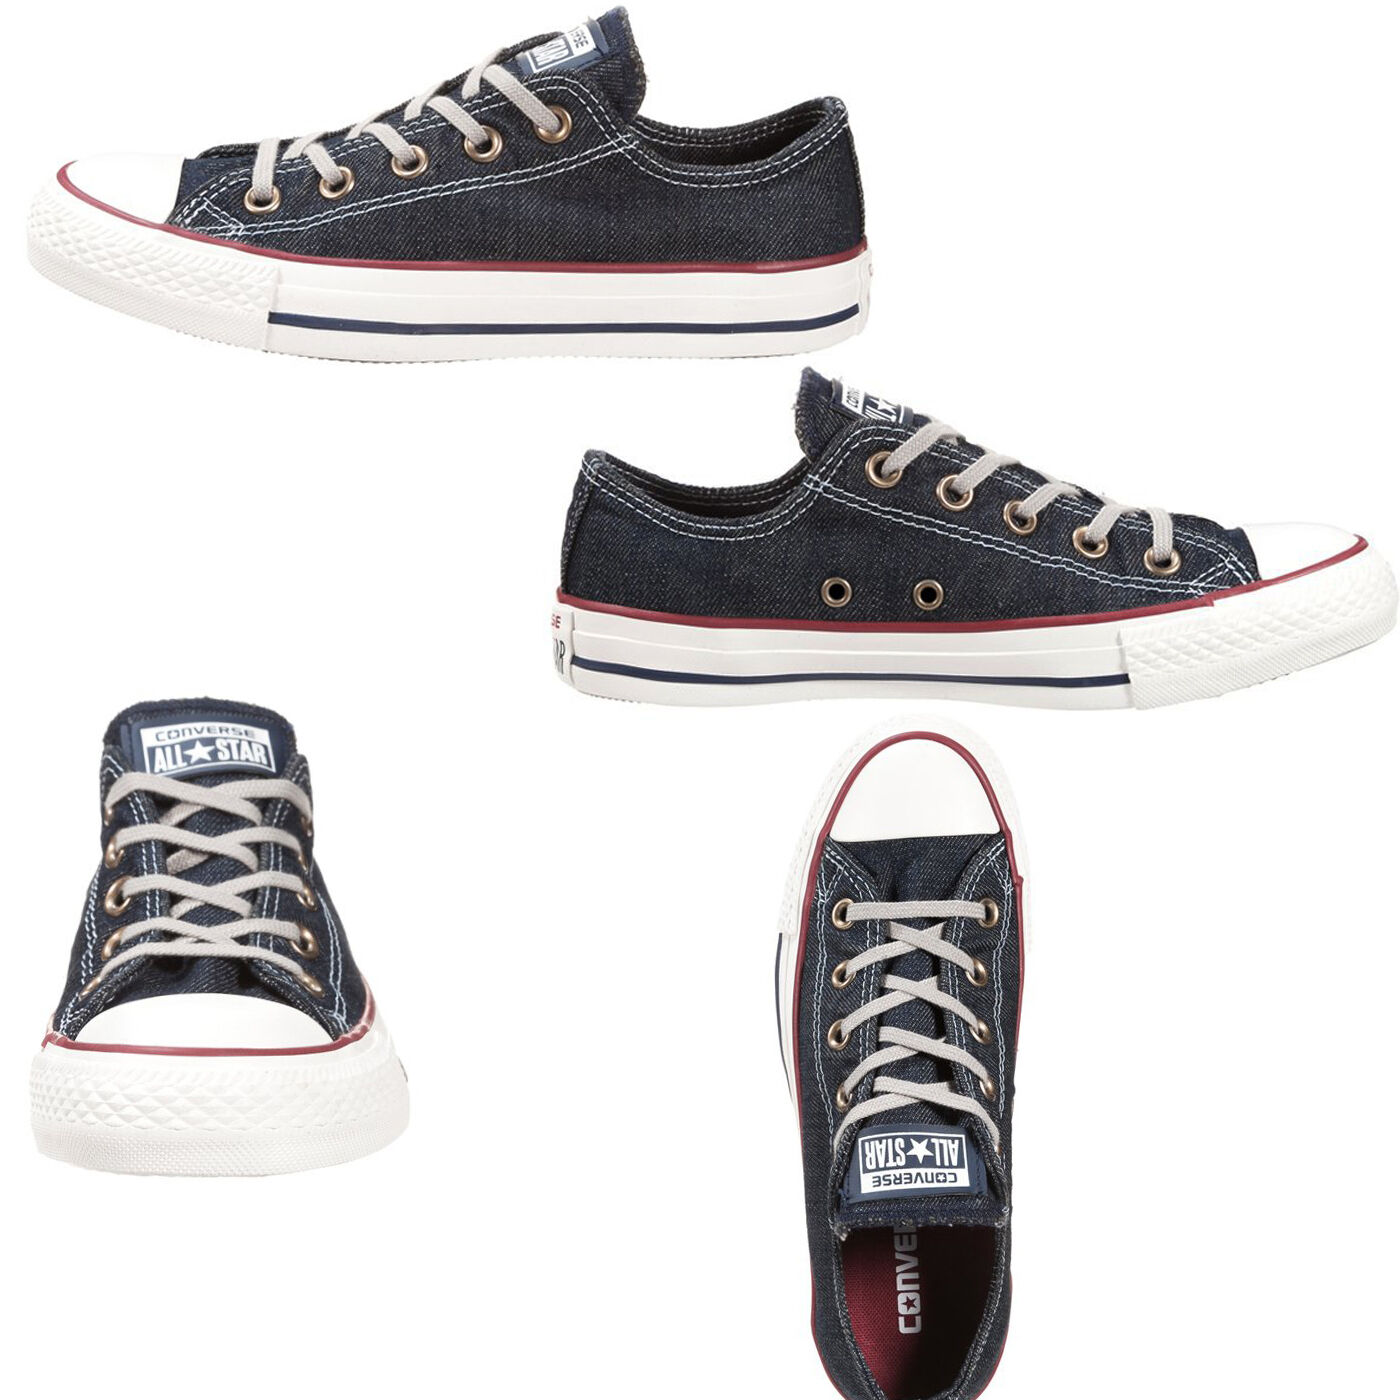 shoes CONVERSE DENIM VAQUEROS ALTOS ALL STAR CHUCK TAYLOR TAYLOR TAYLOR 112185